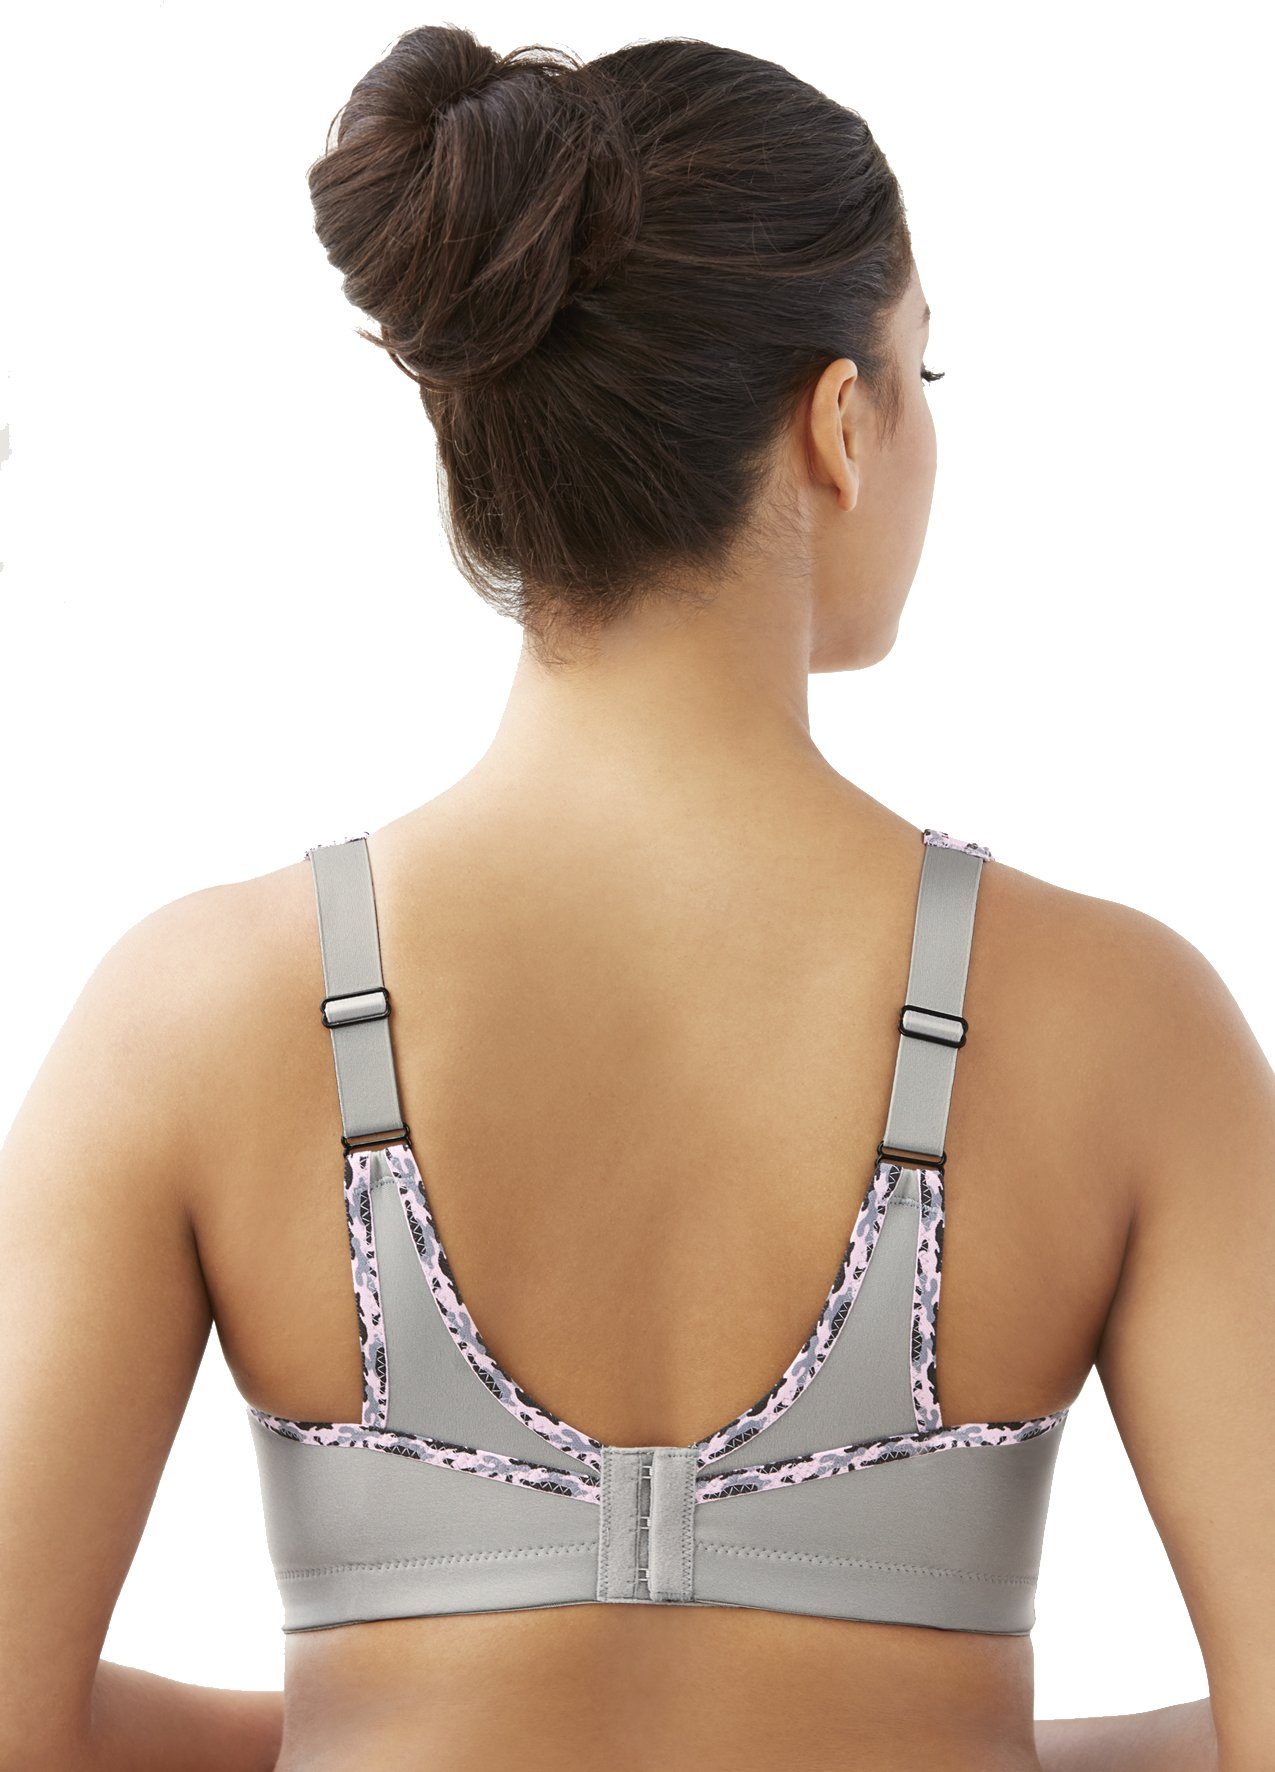 4594bb3c1fd Galleon - Glamorise Women s Plus Size Full Figure No-Bounce Camisole  Wirefree Sports Bra  1066